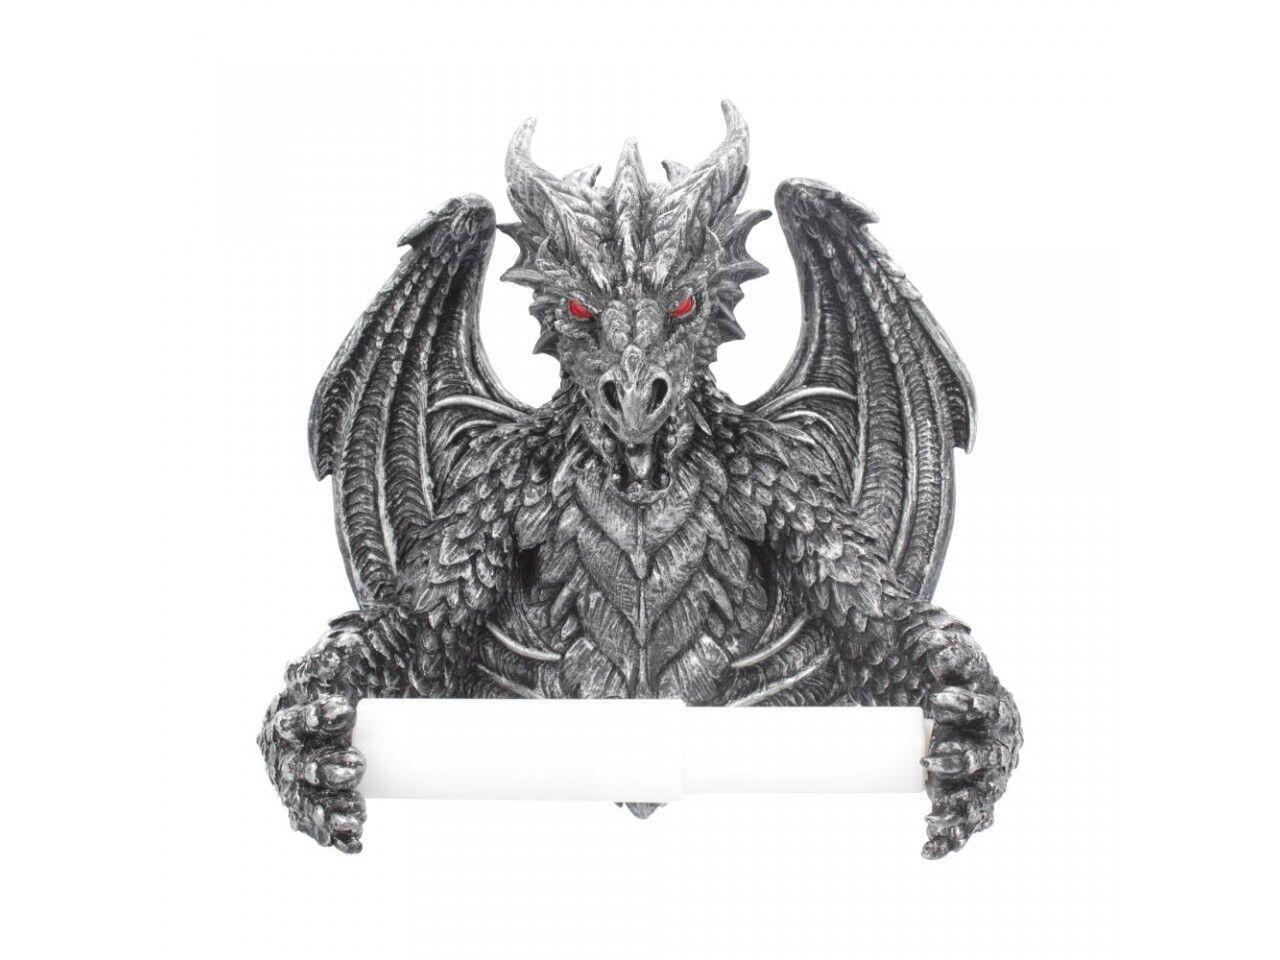 Gothic Gothic Gothic Dragon Portarossoolo beb7bb